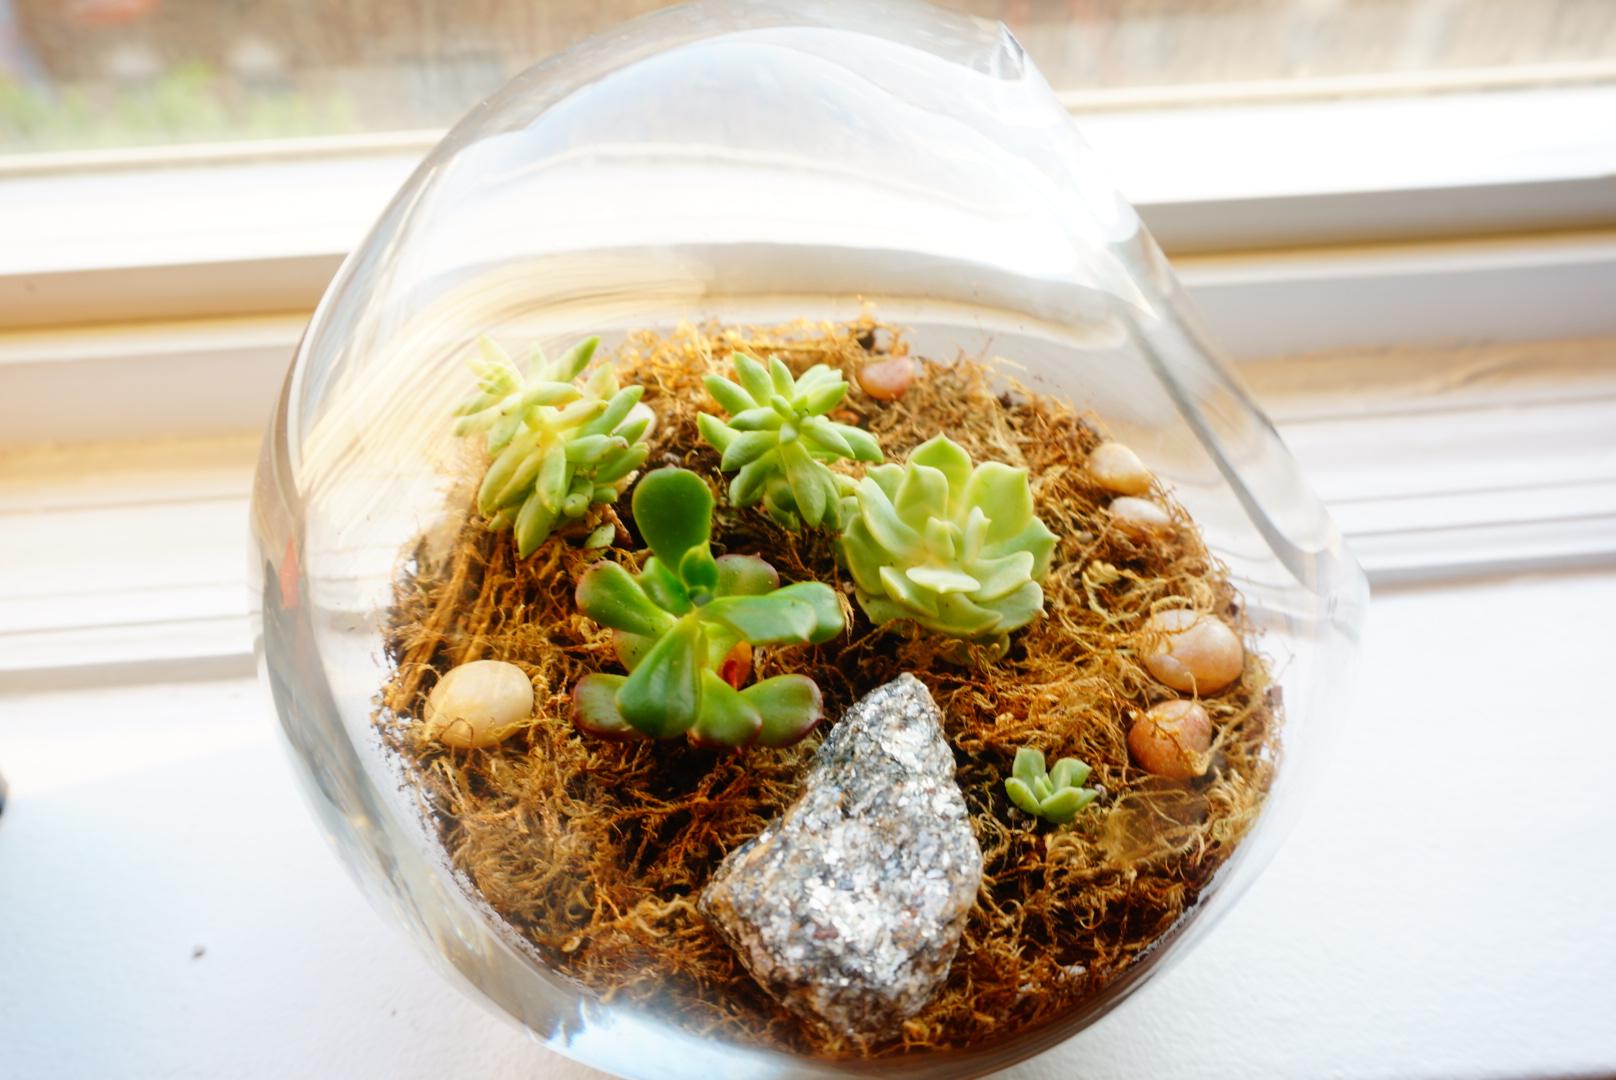 Cute baby terrarium ready for gifting!